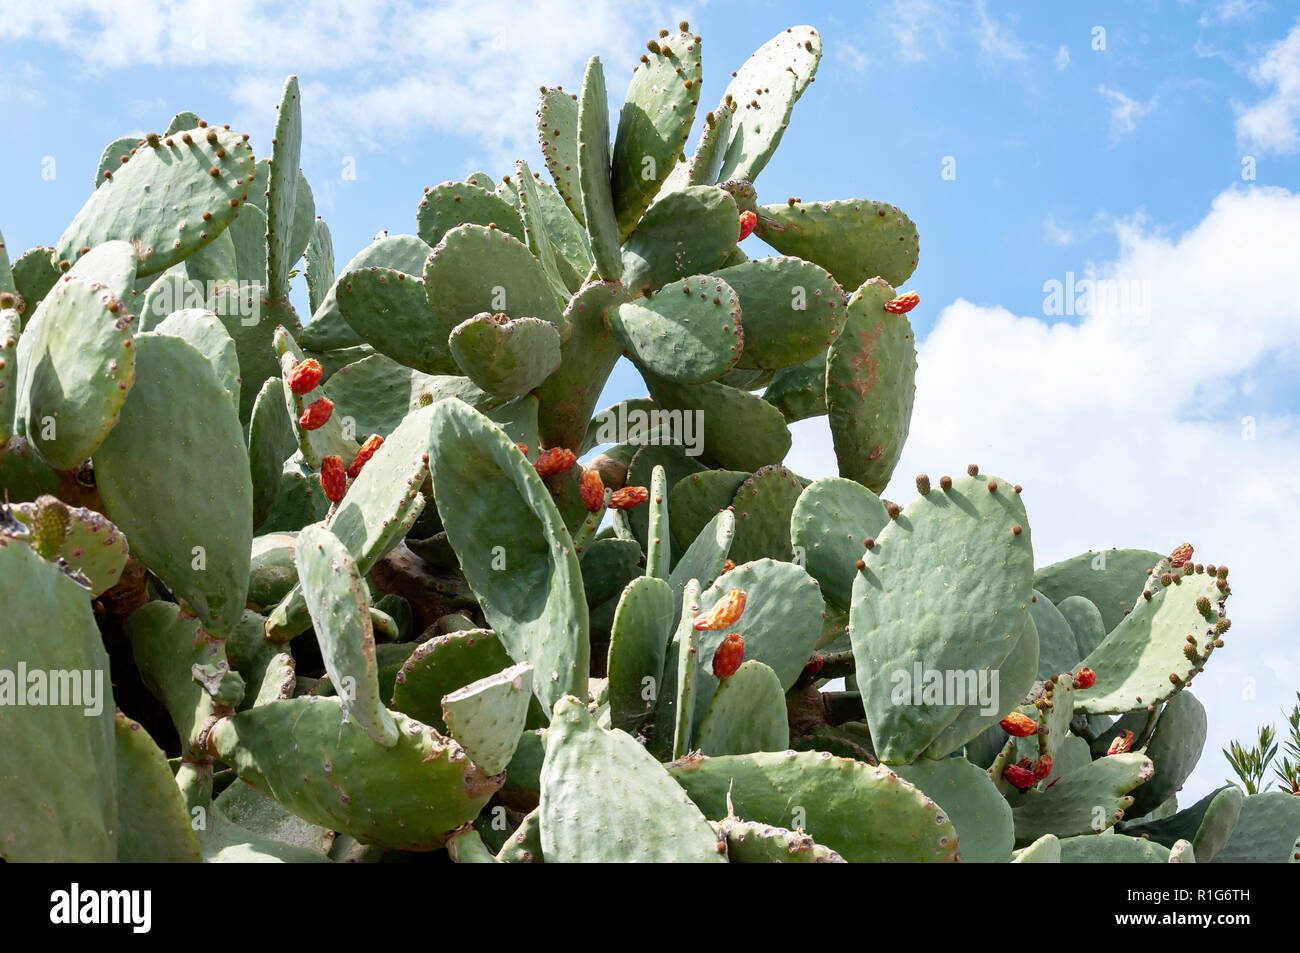 Prickly Pear cactus plant, Kouklia, Pafos District, Republic of Cyprus Stock Photo